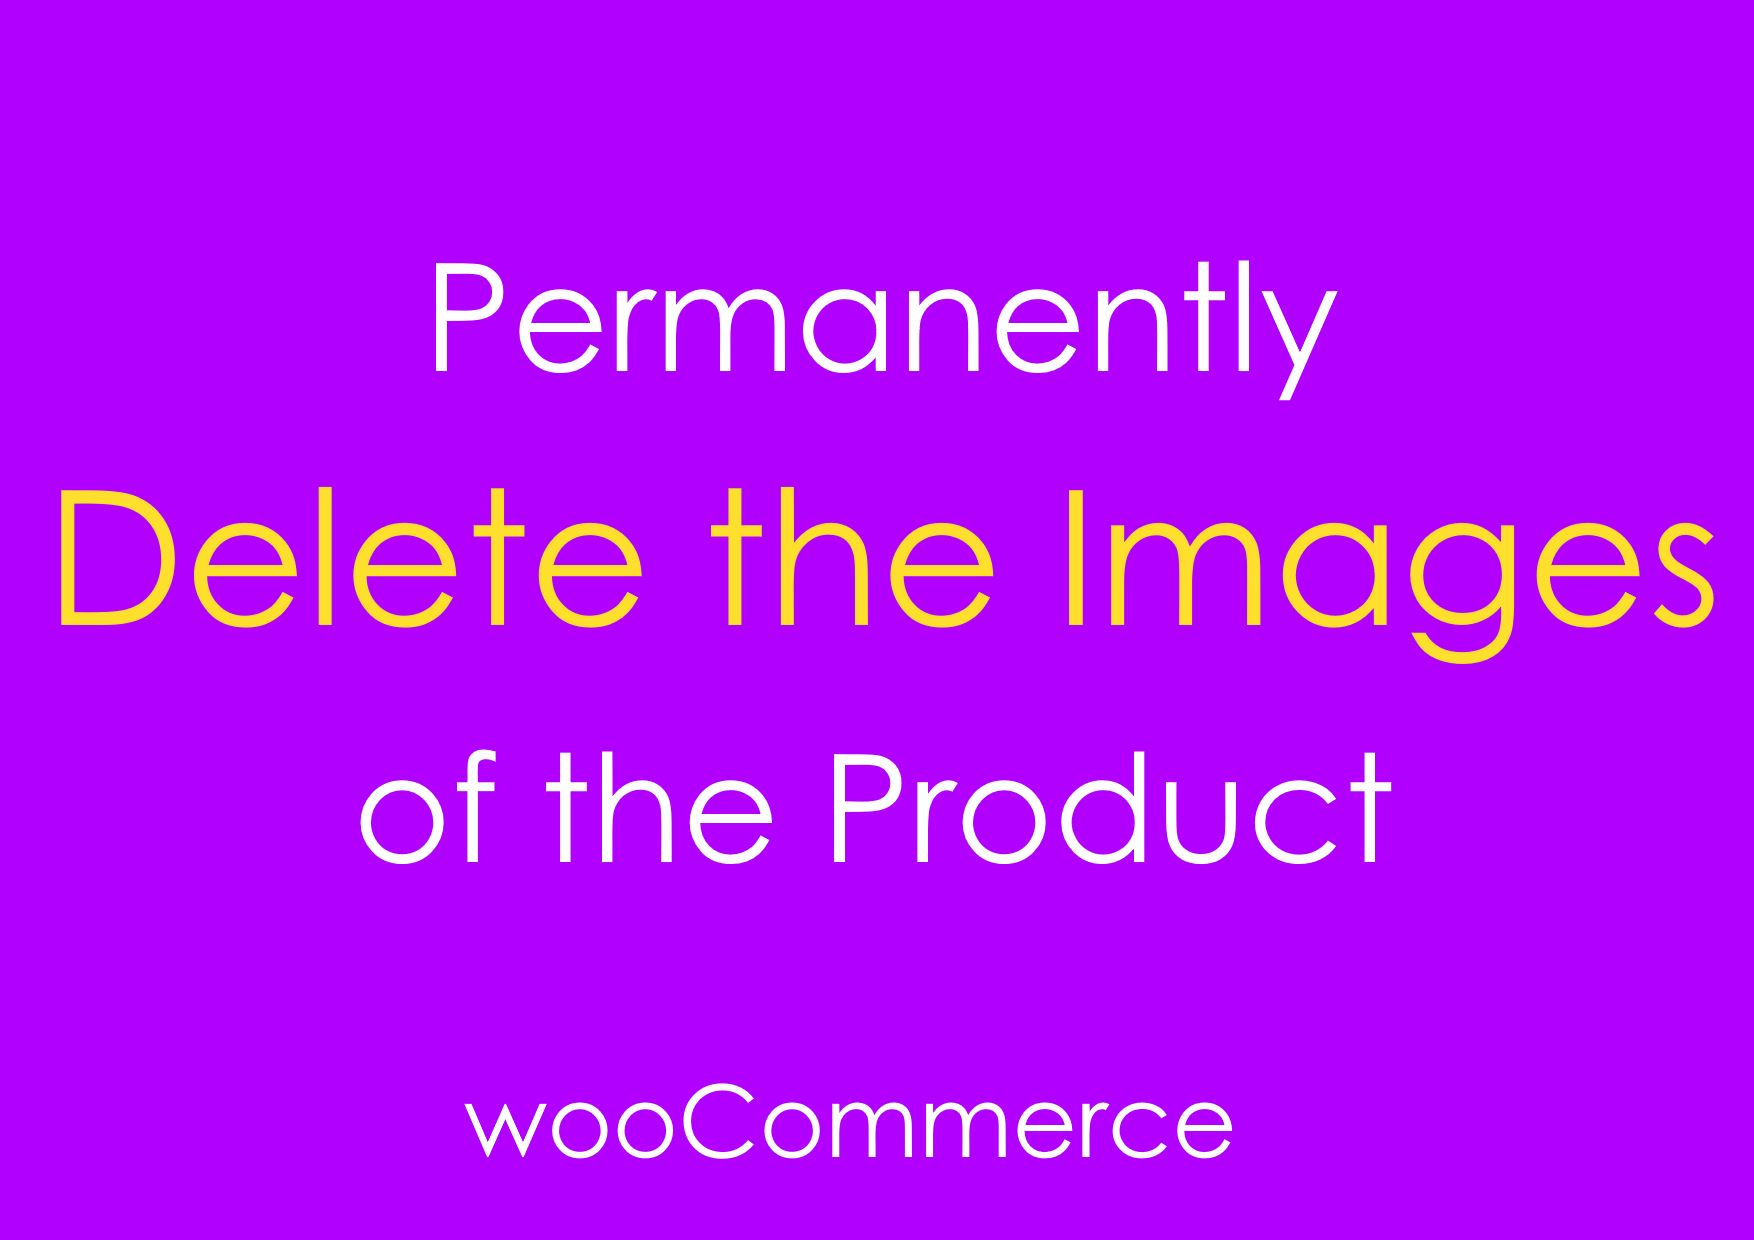 woocommerce delete images permanently